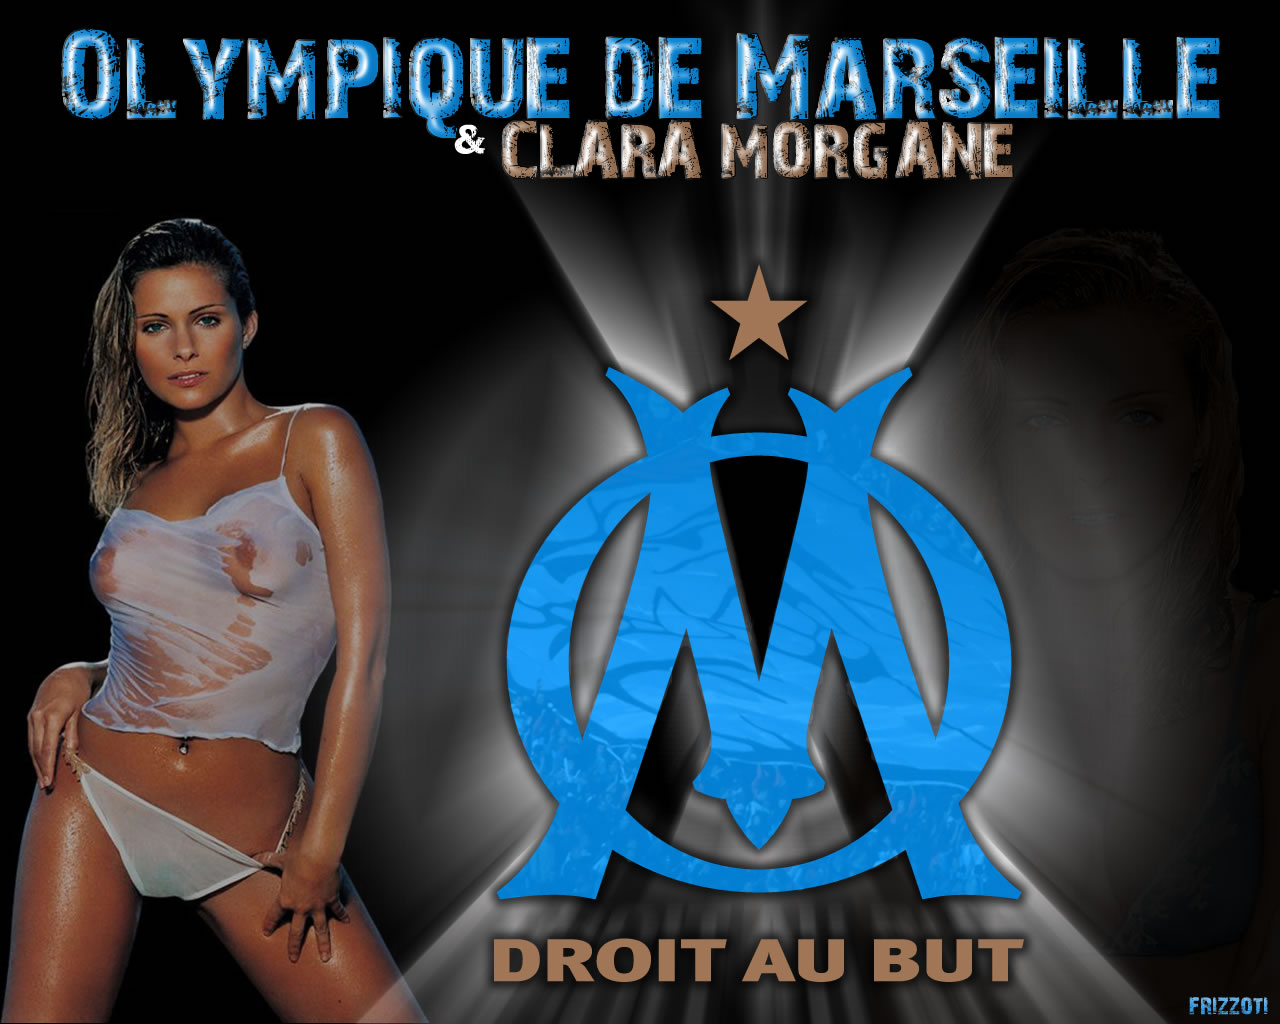 Fonds d'écran Sports - Loisirs OM Olympique de Marseille et Clara Morgane